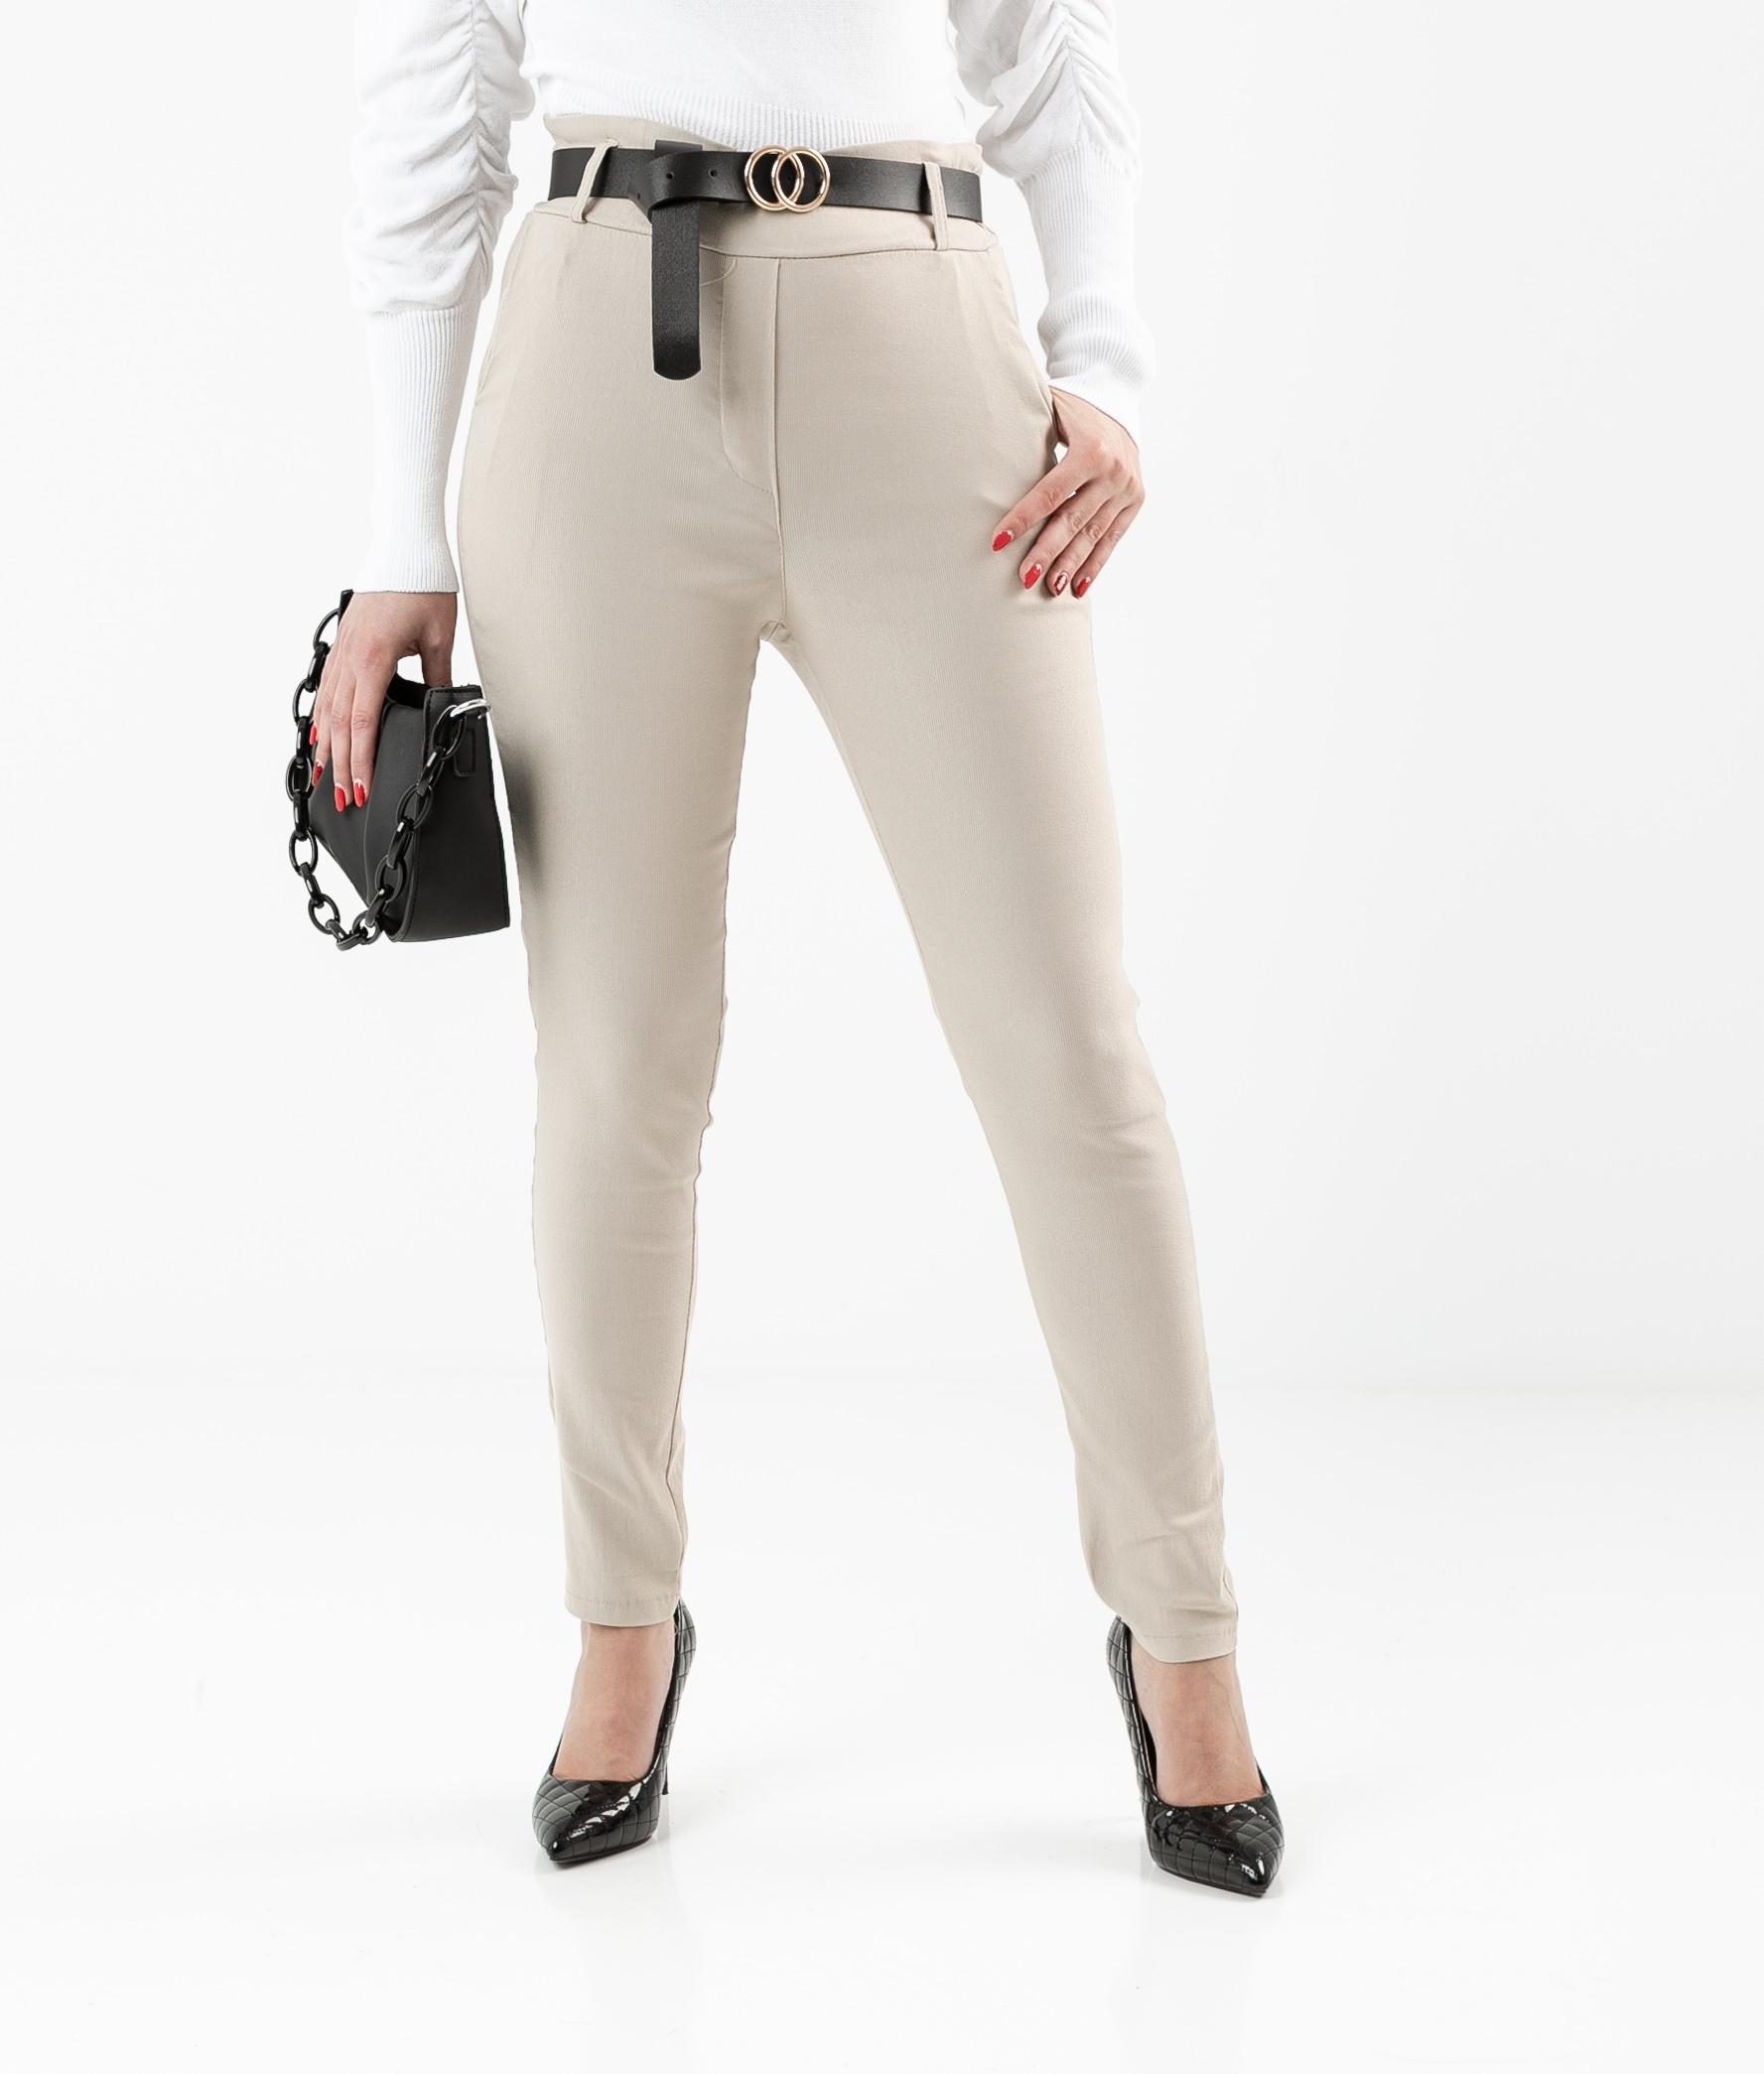 Pantalon Adriel - Beige